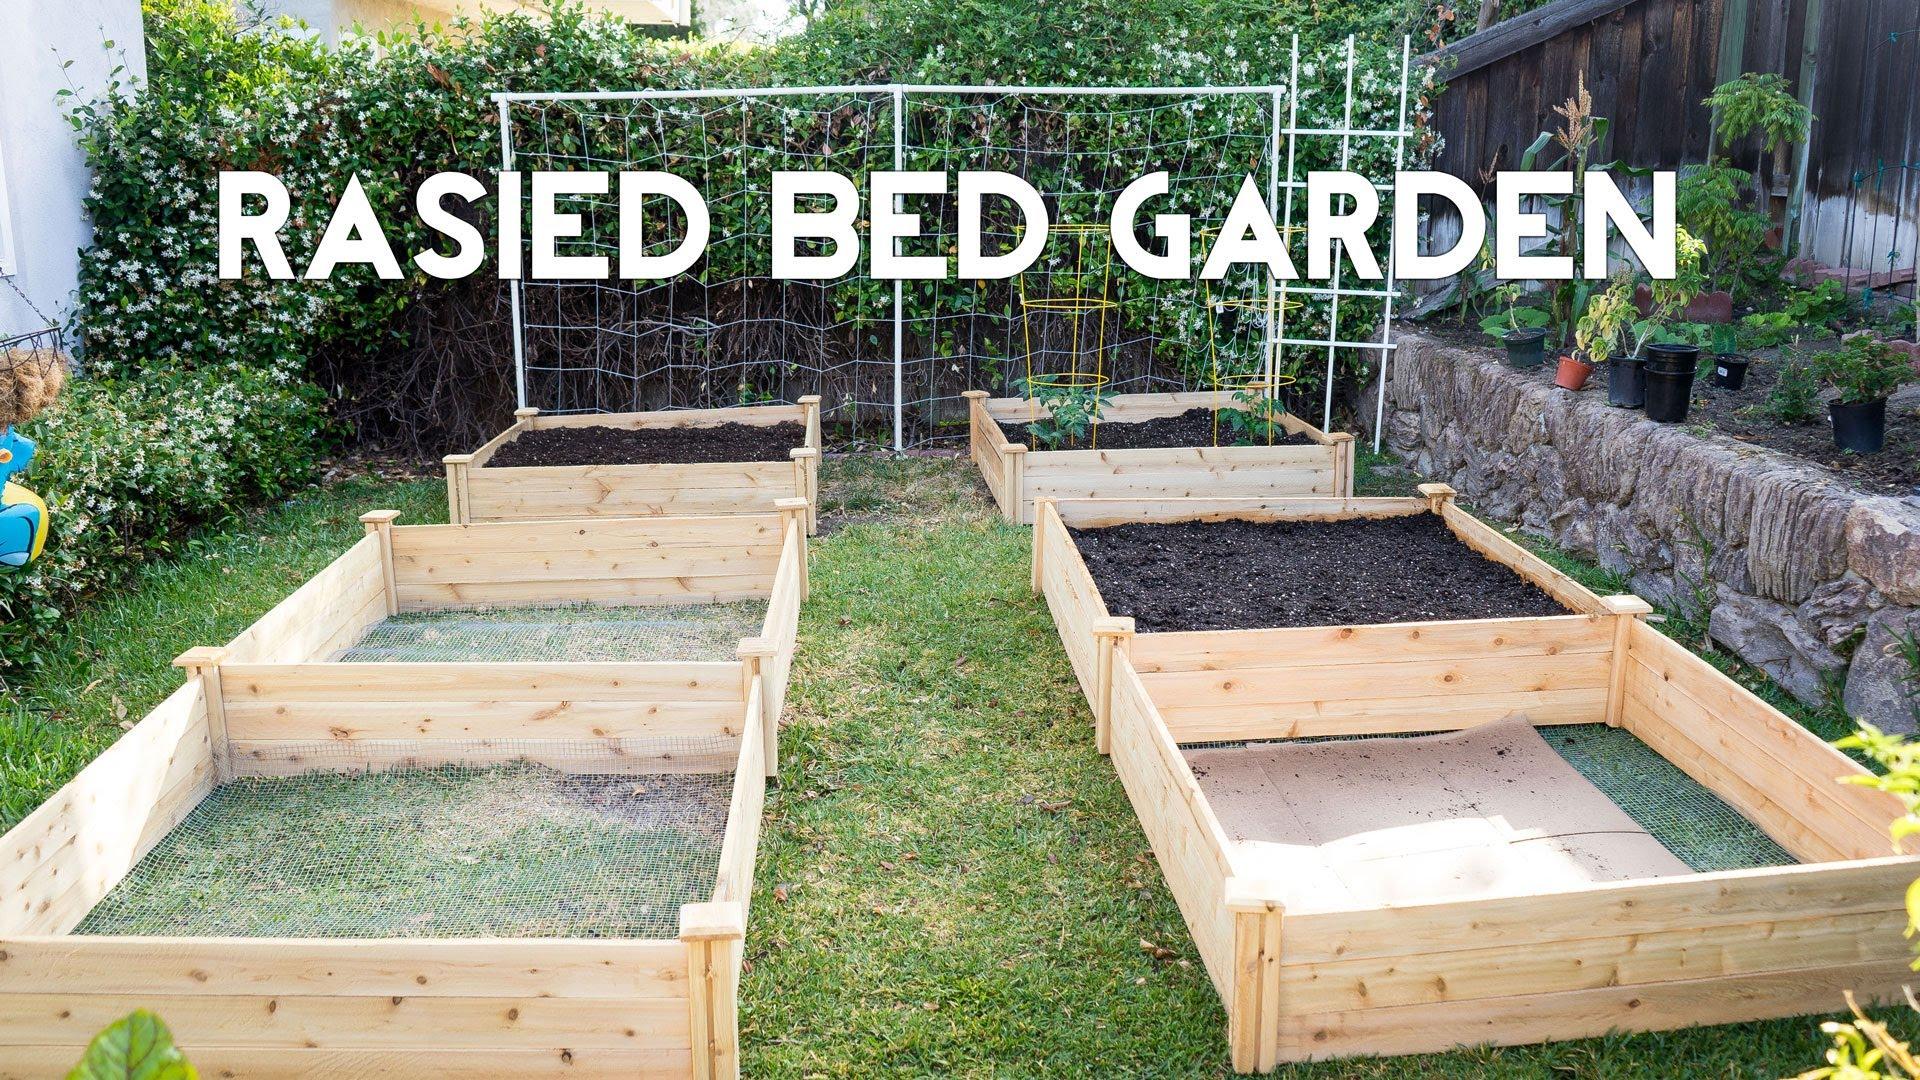 raised bed garden raised bed gardening - how to start a raised bed vegetable garden - youtube FXZBIWX